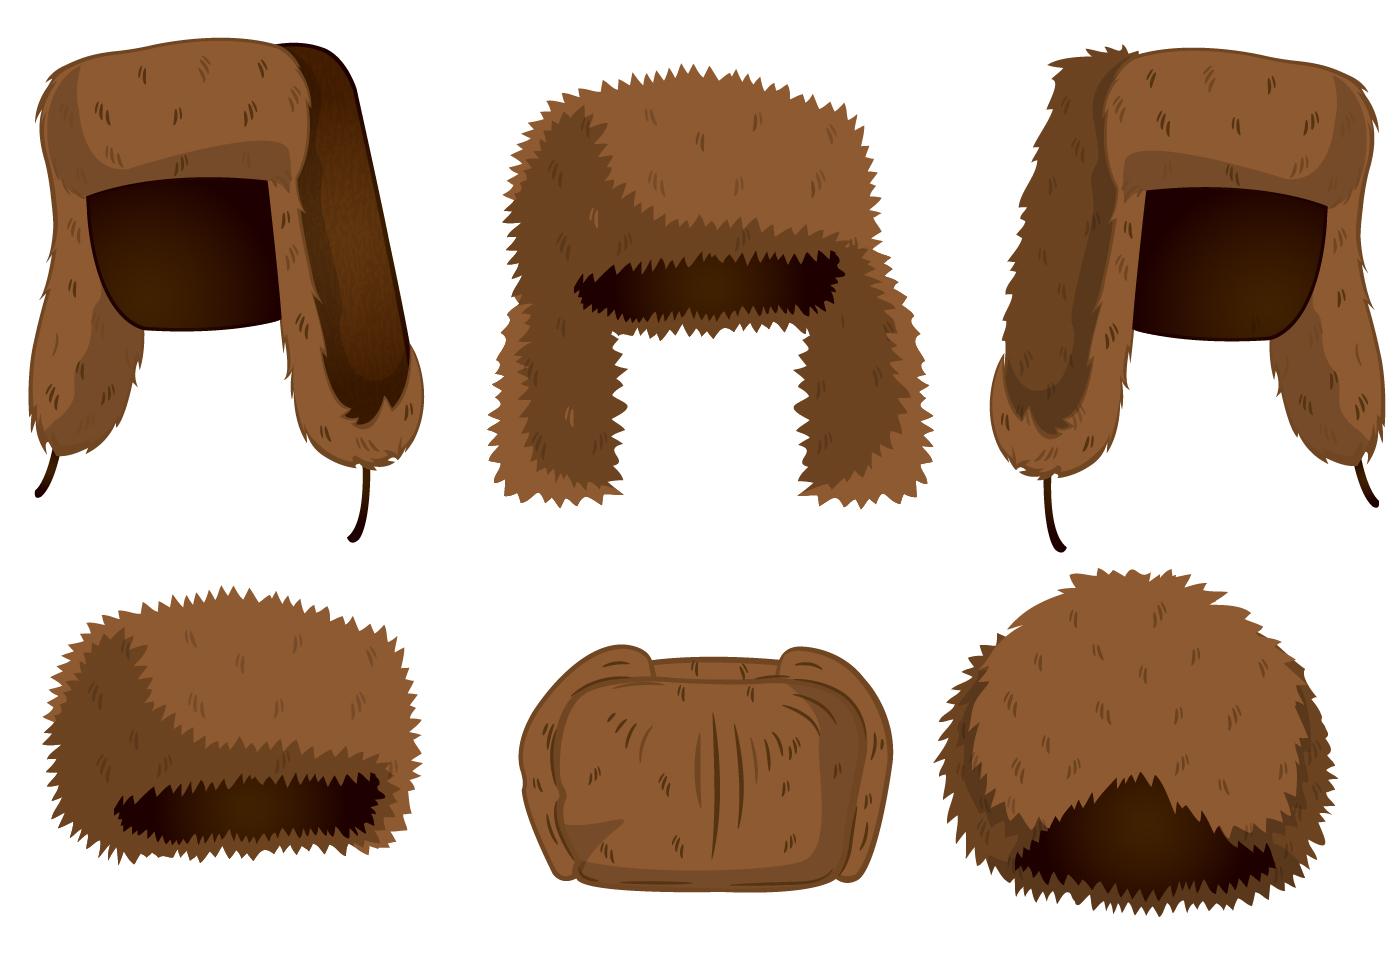 Fur Hat Vectors - Download Free Vector Art, Stock Graphics